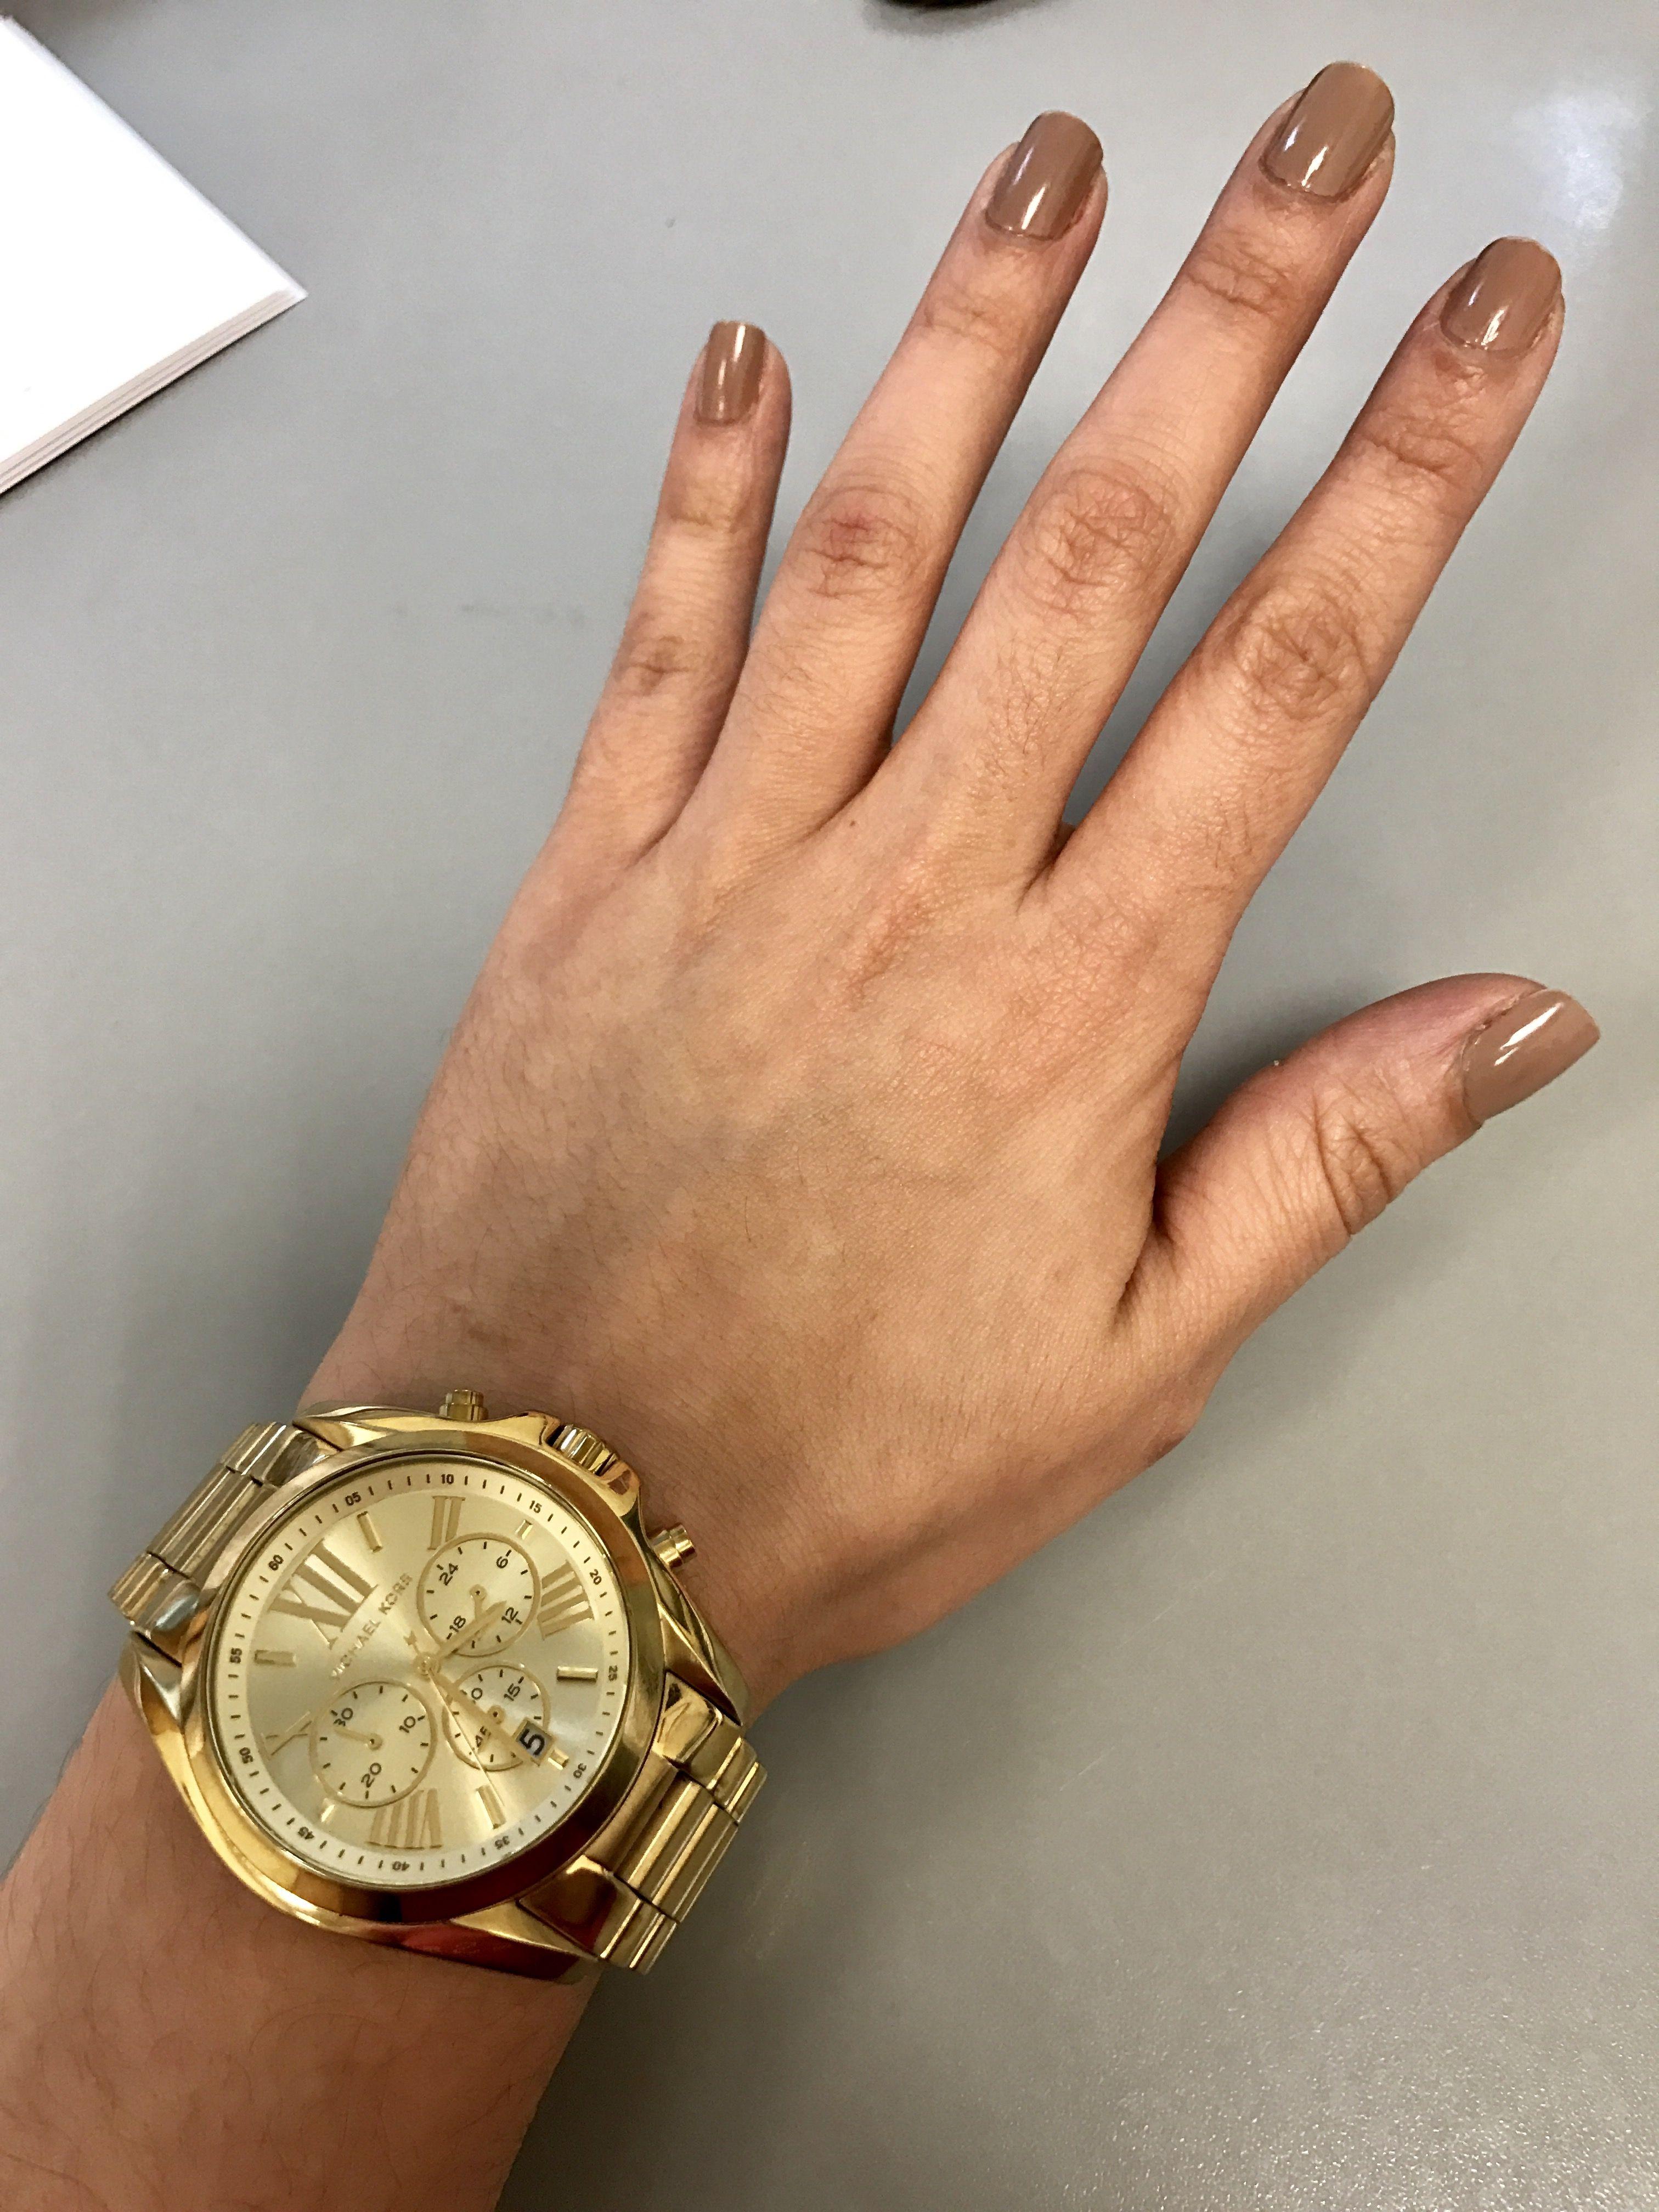 56ab1b1f7e401 Michael Kors MK5605 Gold watch